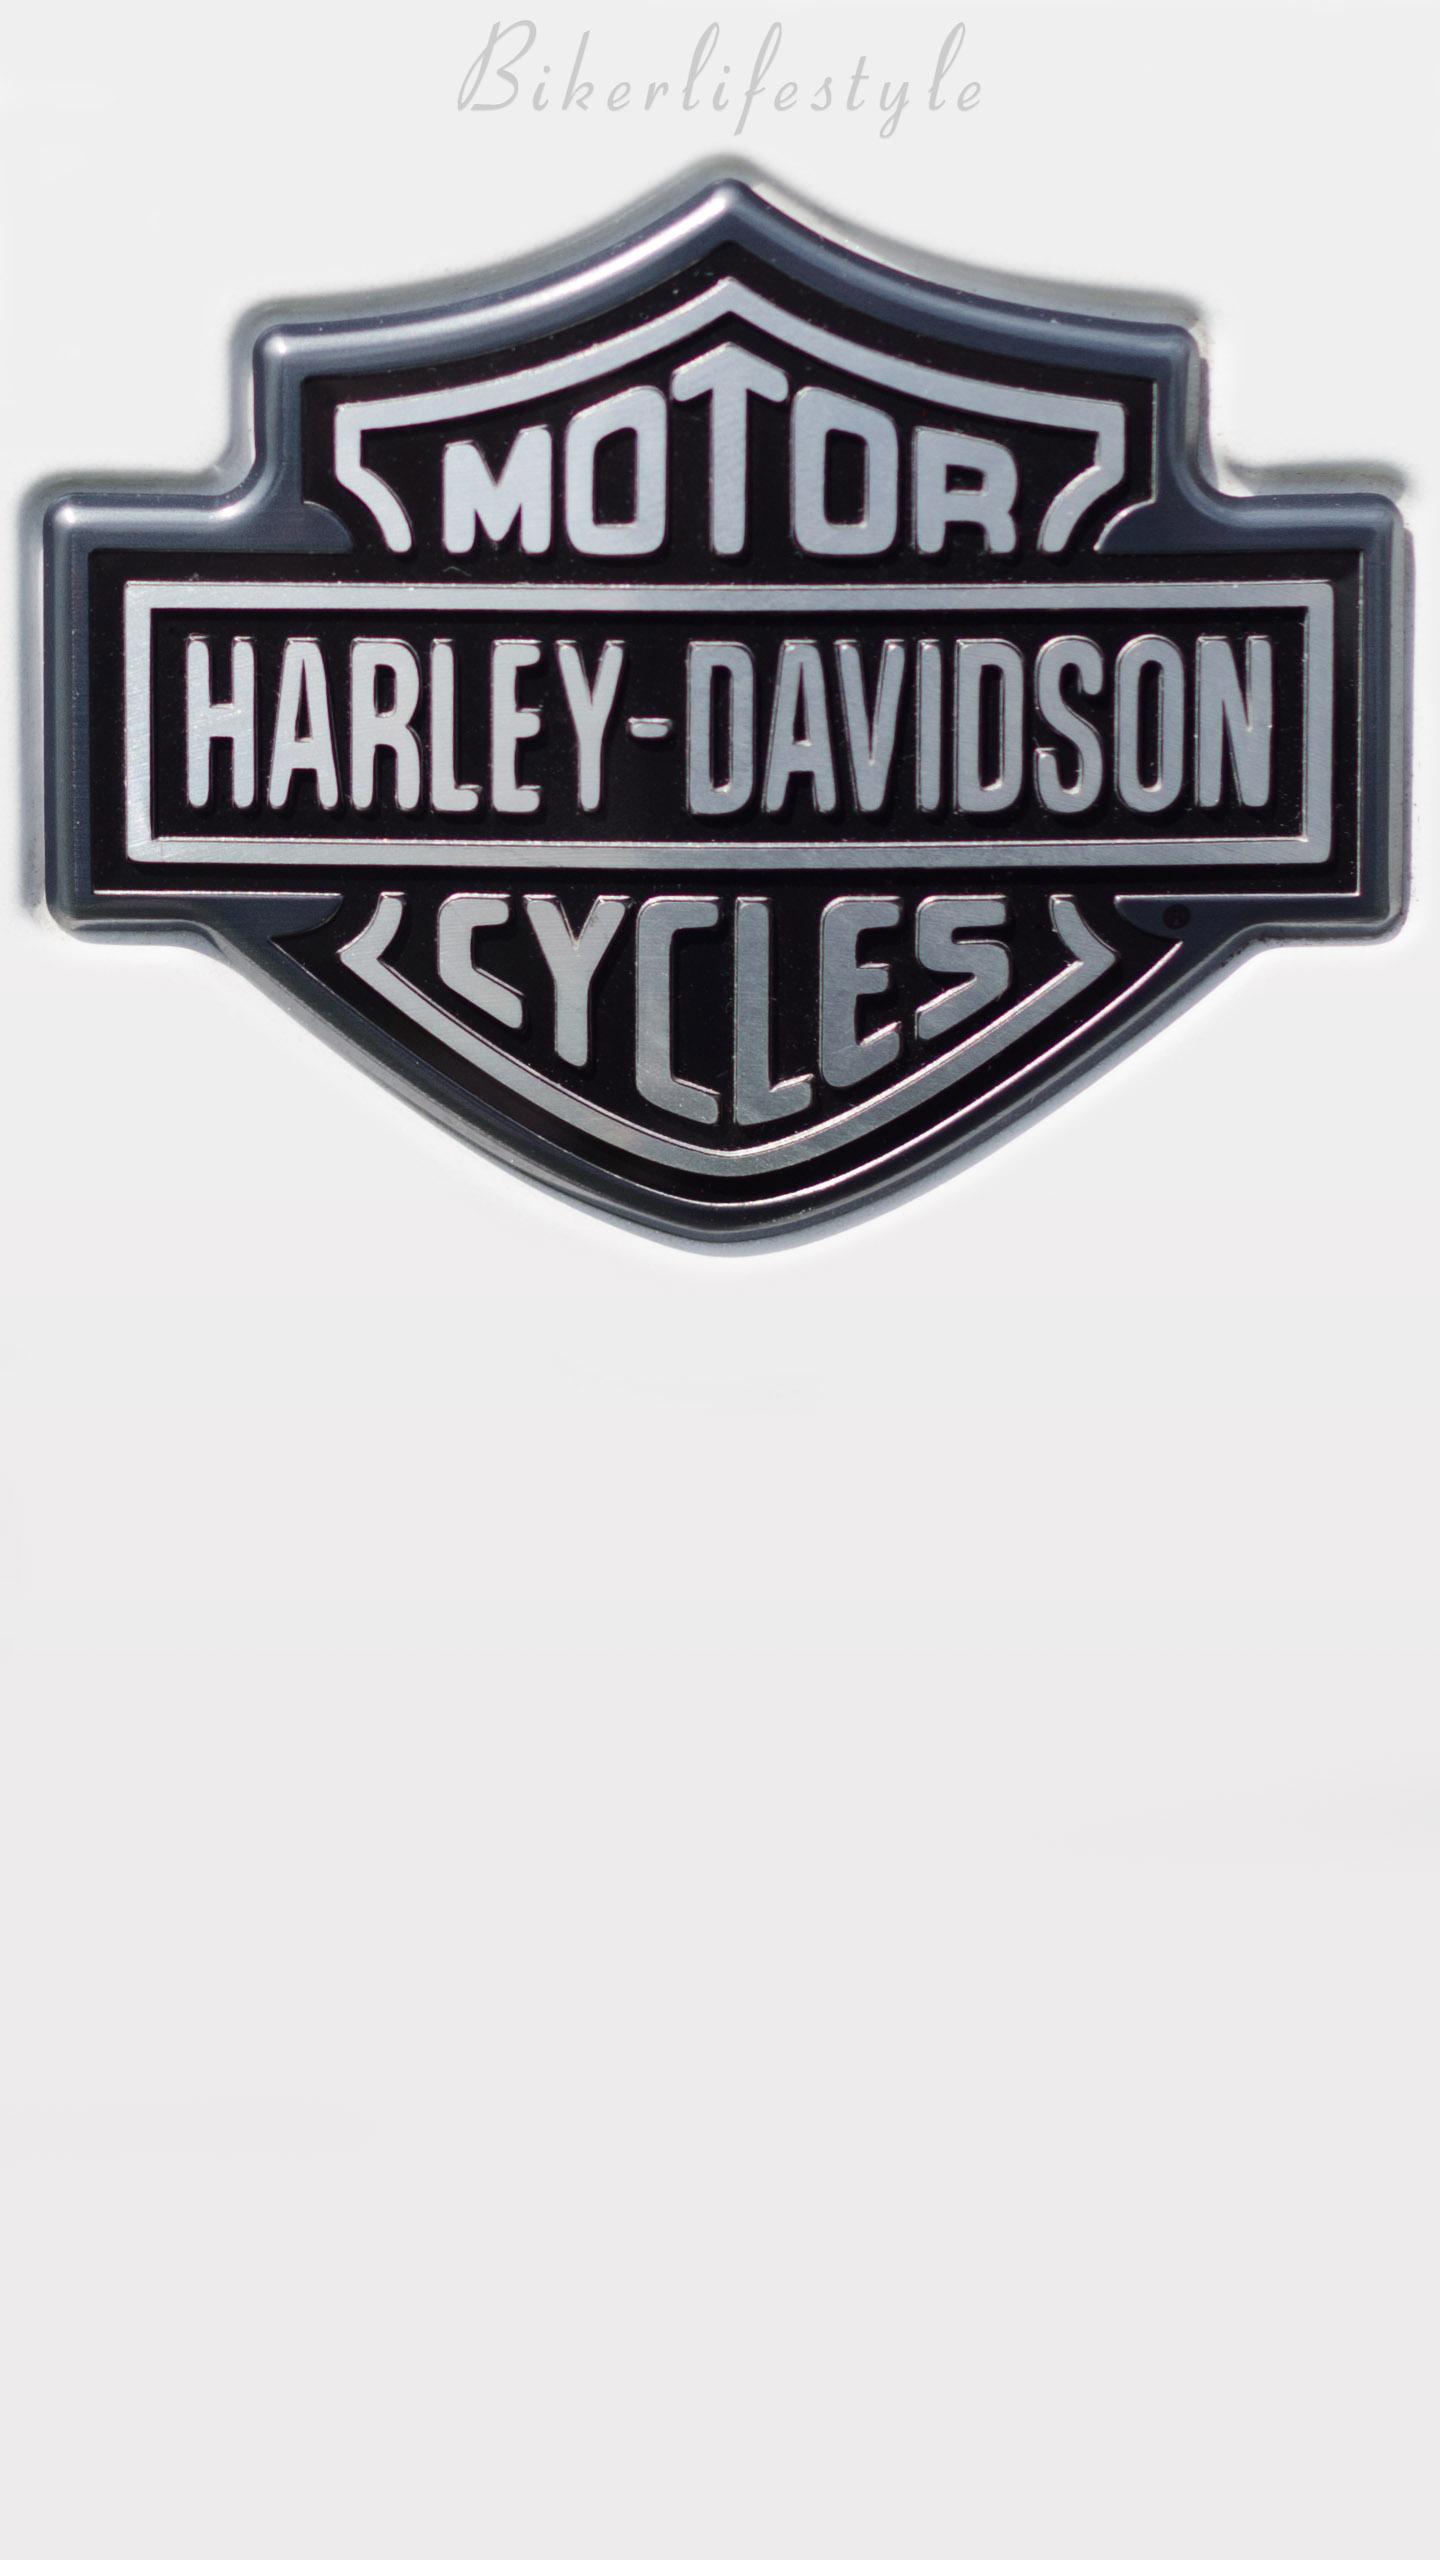 HD Logo Harley Davidson Wallpaper 1440x2560